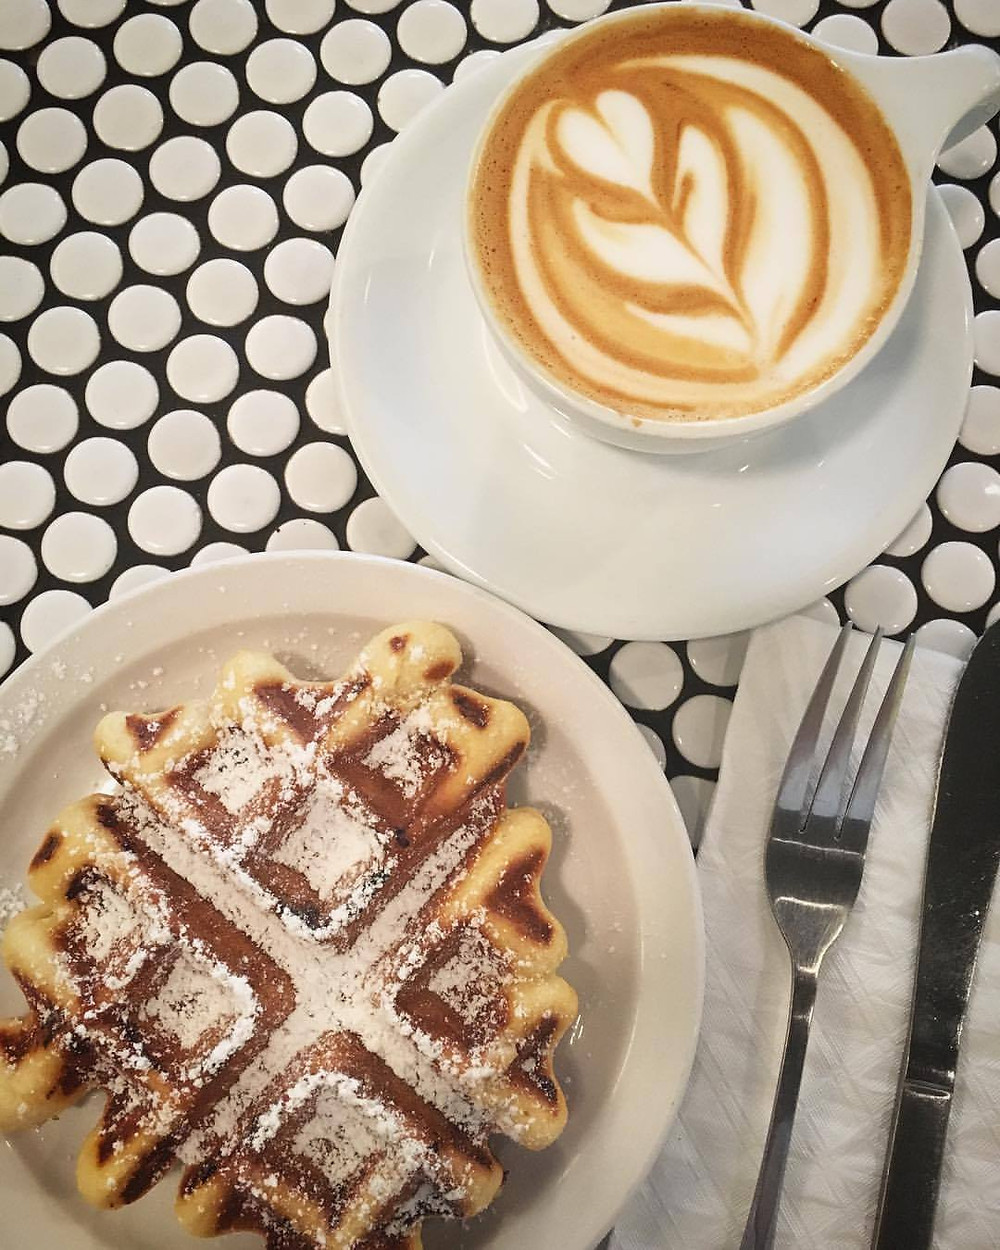 Trendy Coffee Hotspots in the South by Jenny Cox Holman, Jenny Cox Holman writer